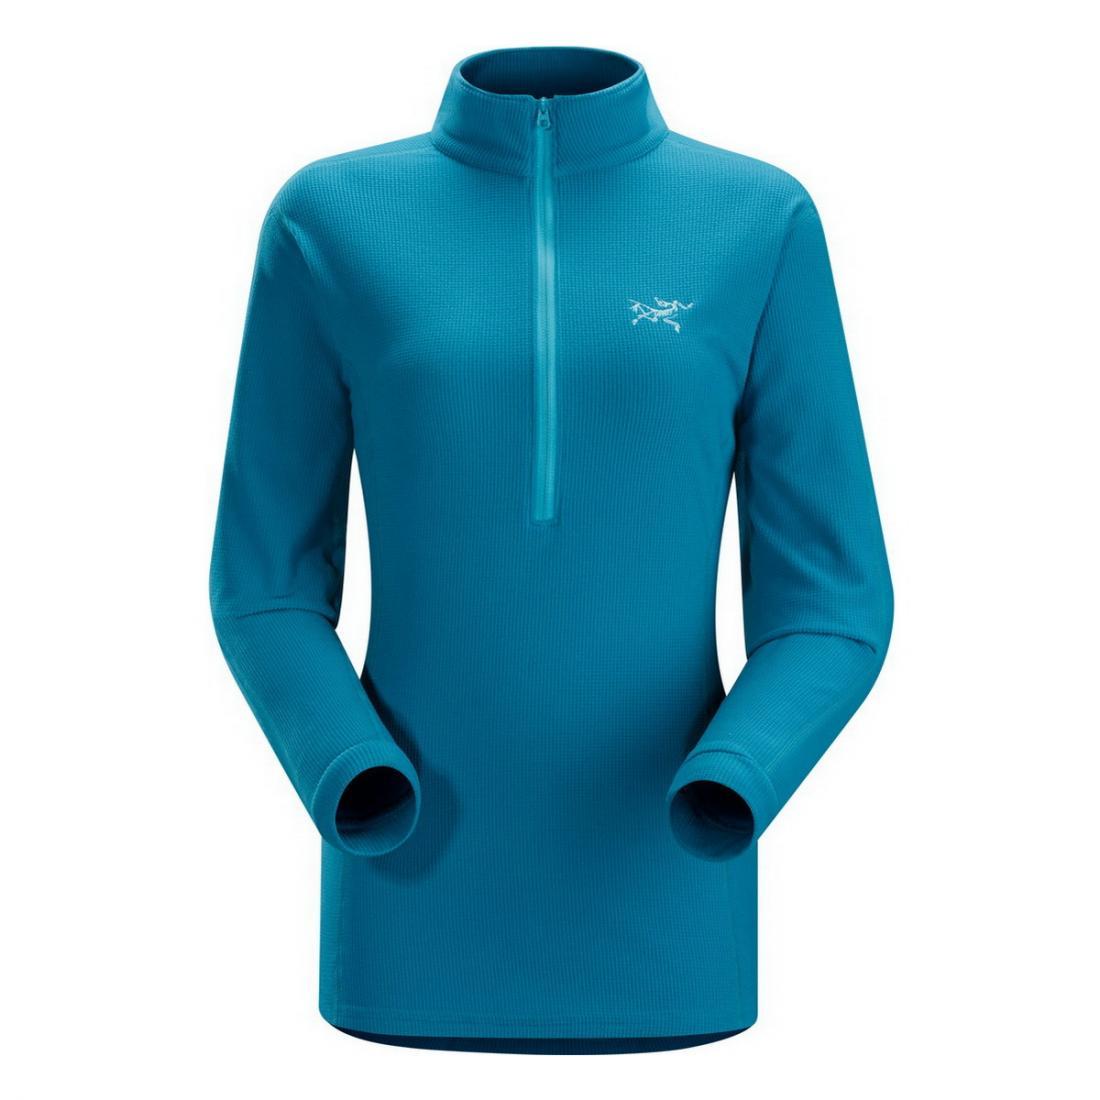 Куртка Delta LT Zip жен.Пуловеры<br><br><br>Цвет: Синий<br>Размер: M